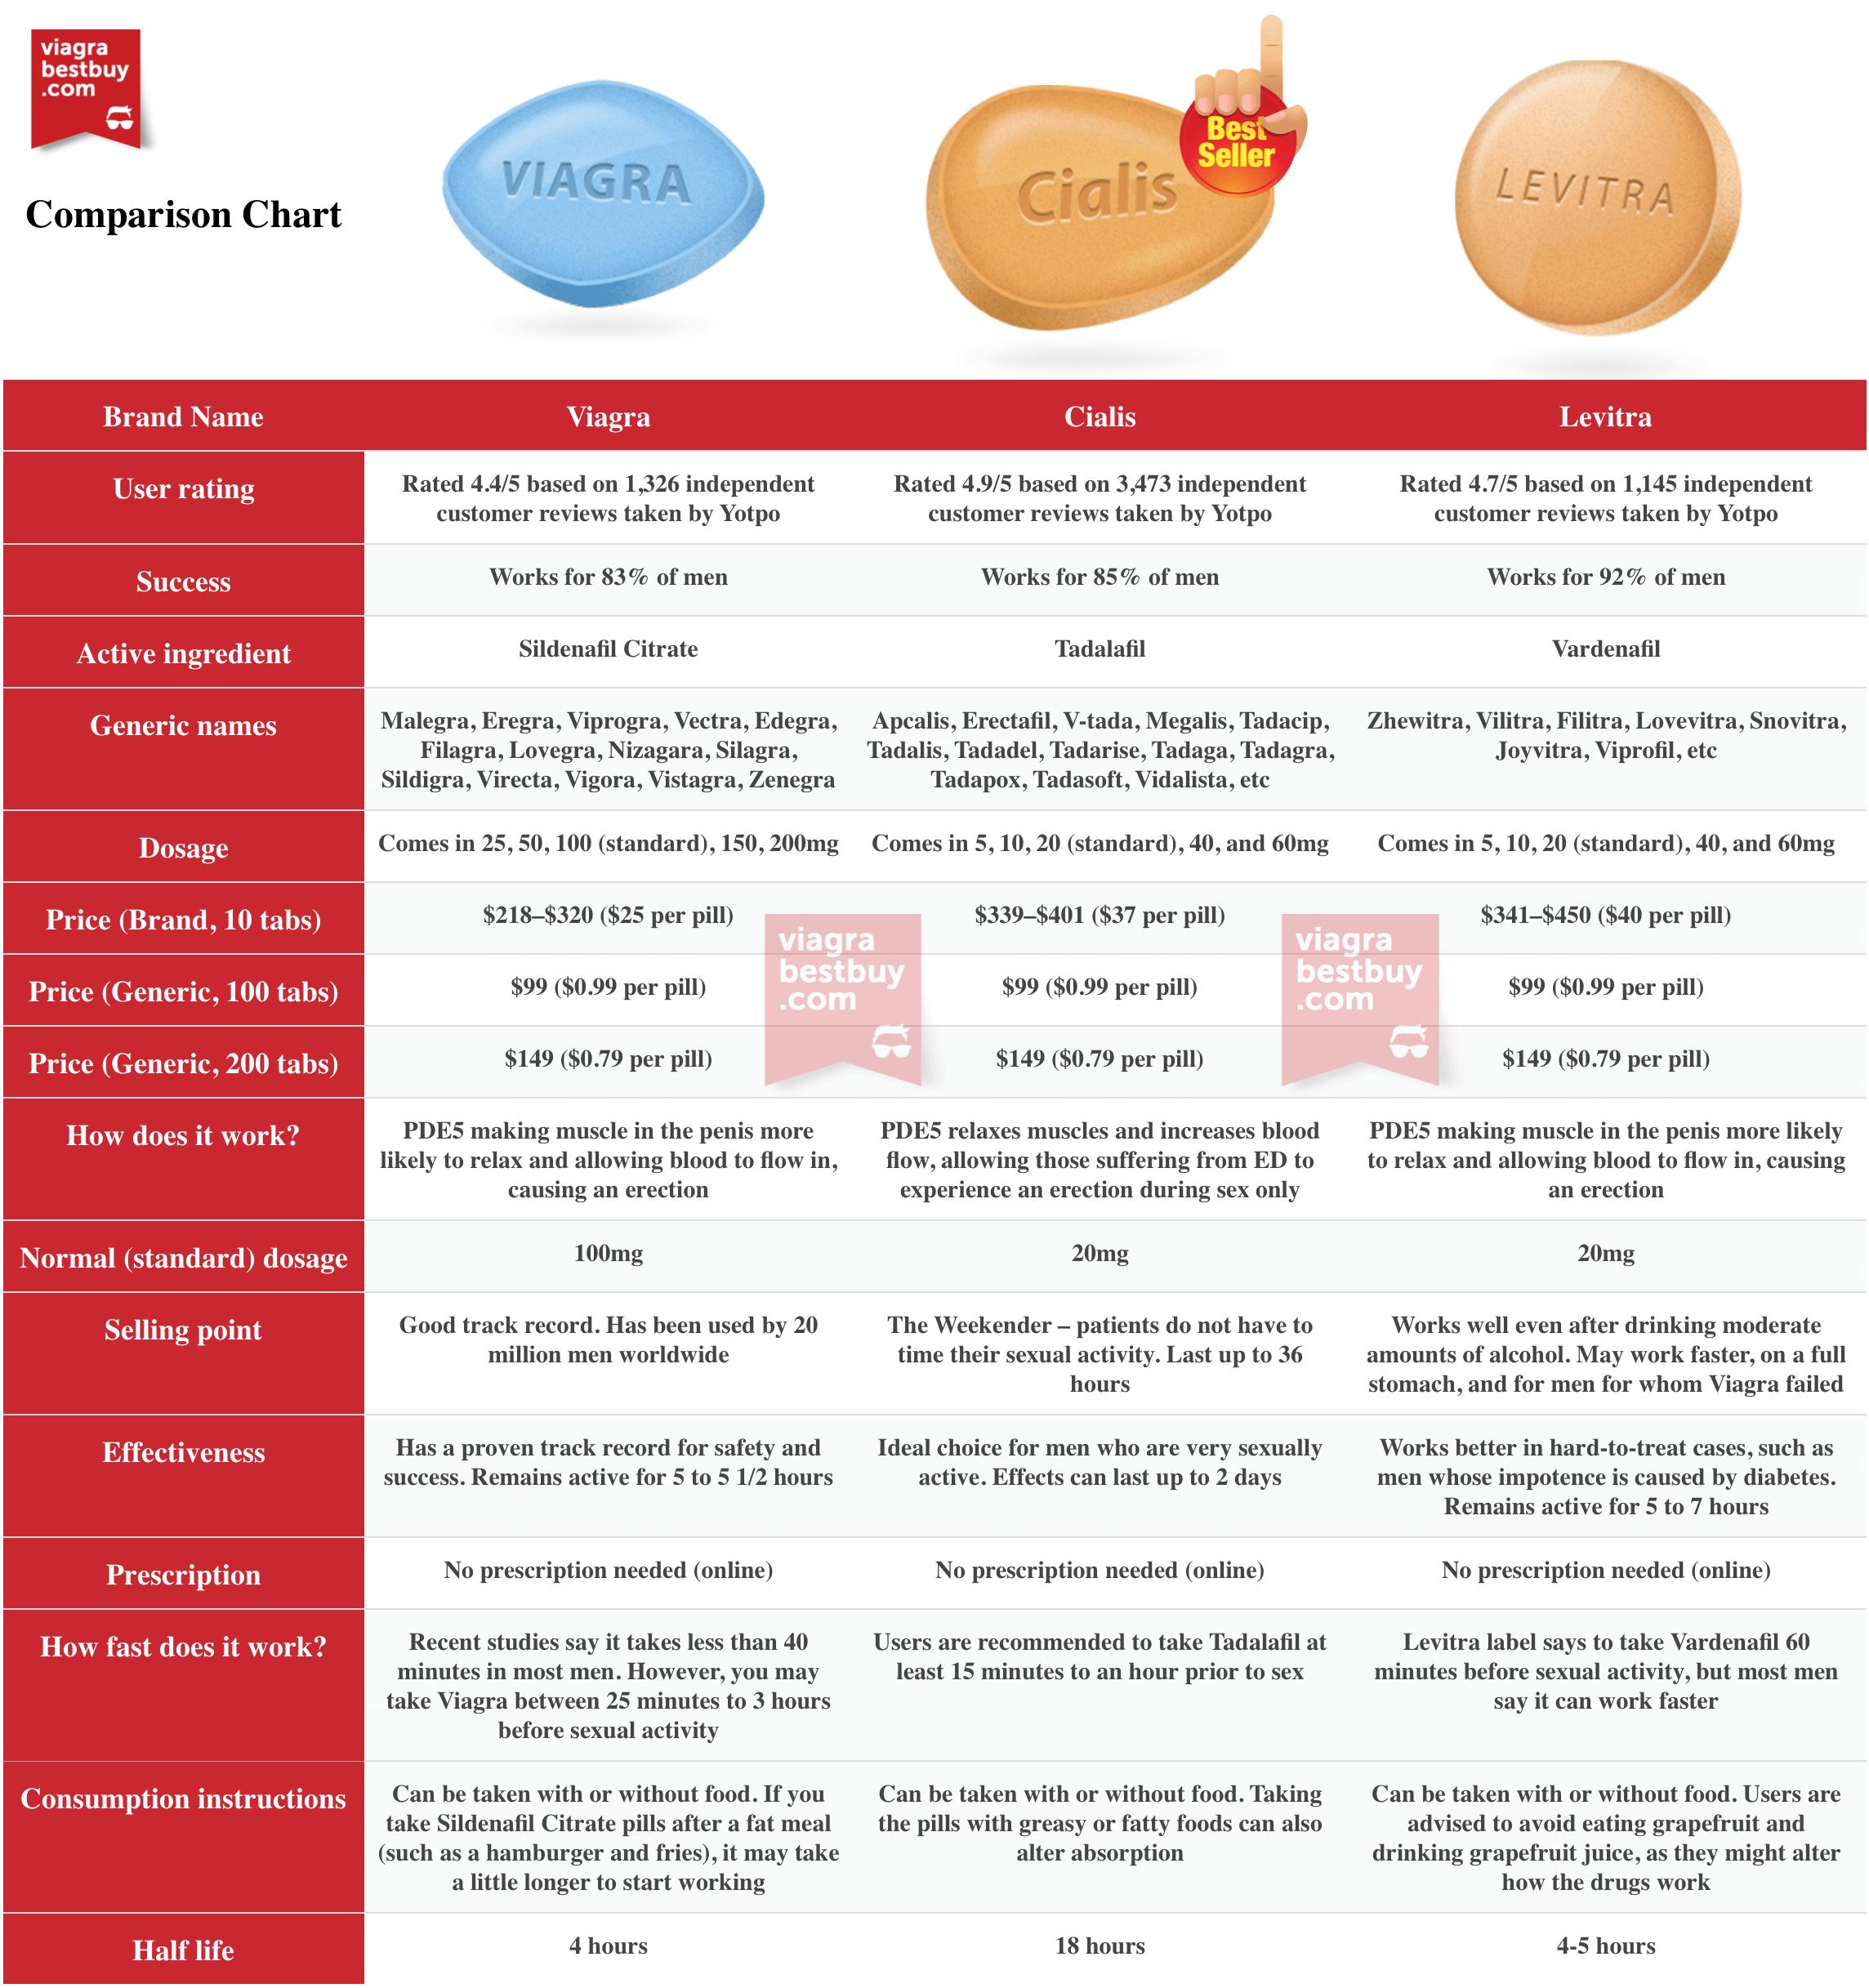 Viagra vs Cialis vs Levitra Comparison Chart